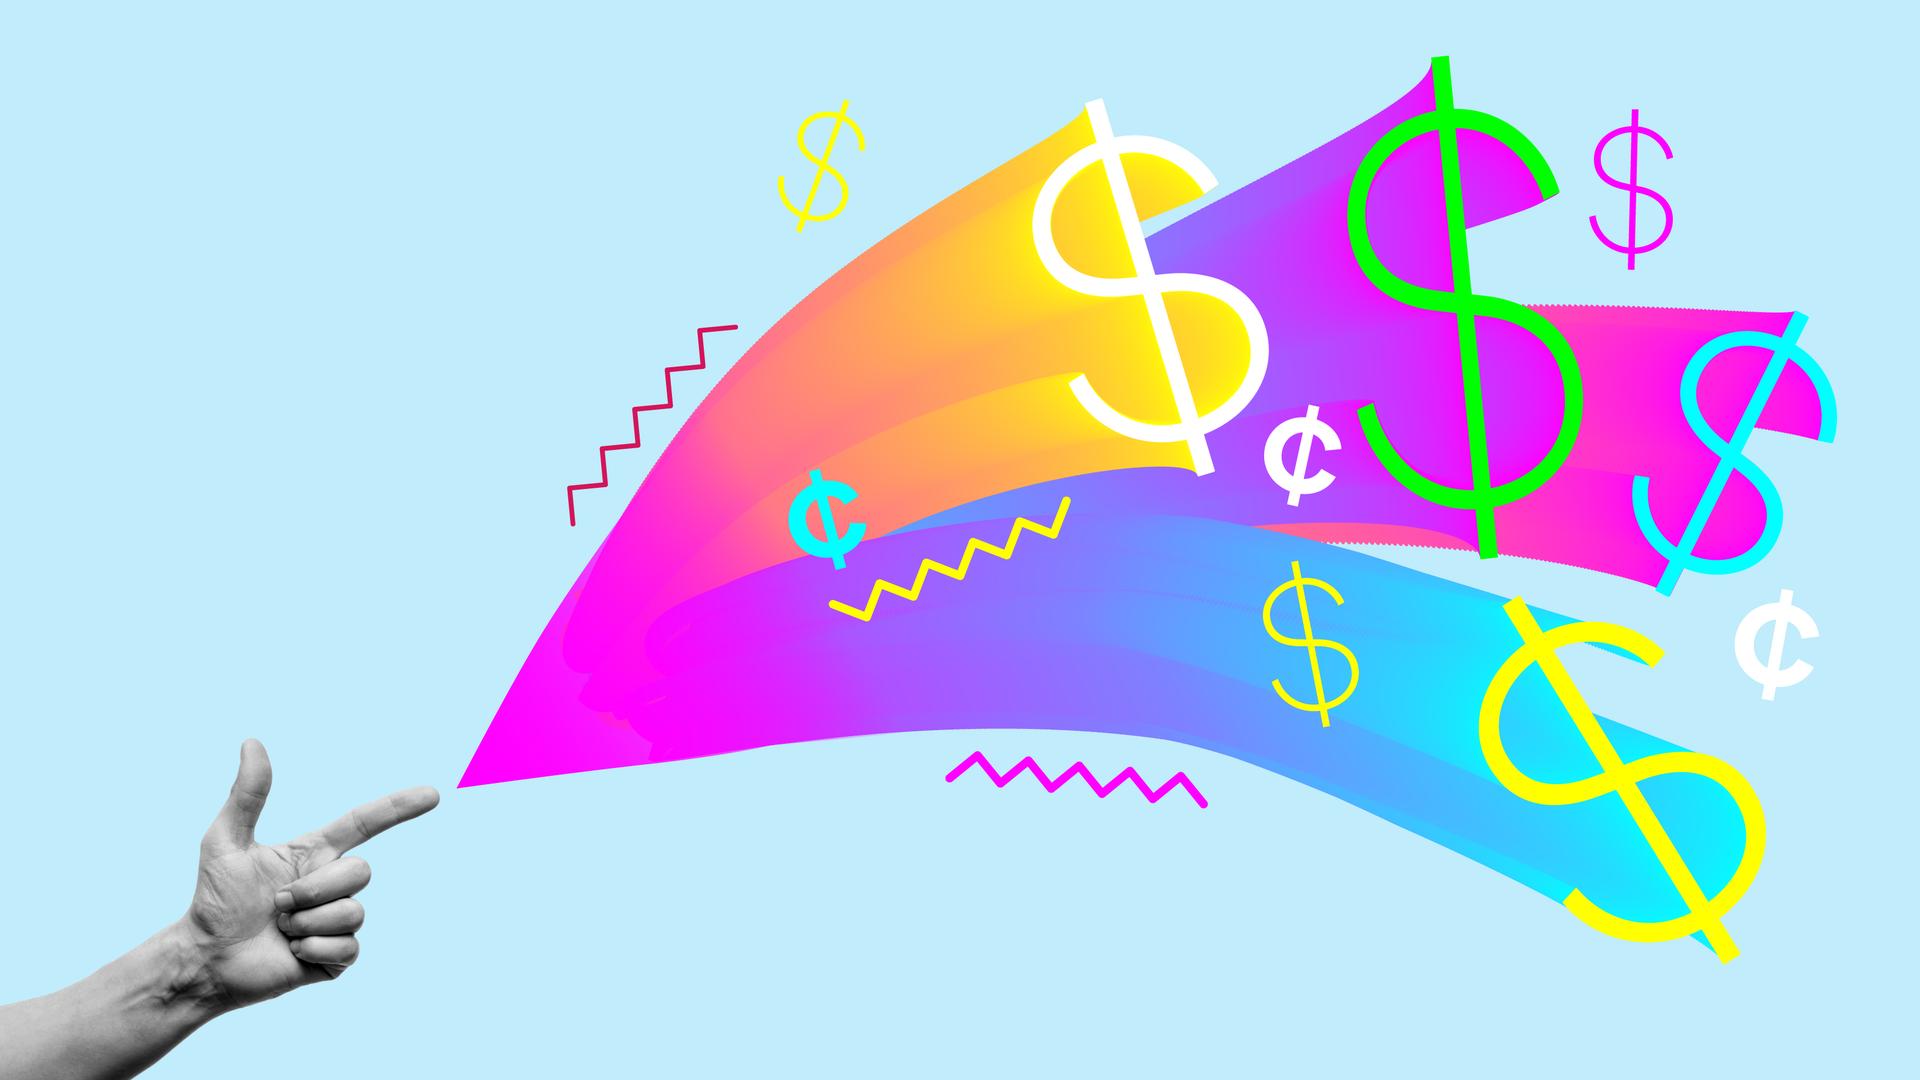 Illustration of venture capital funding